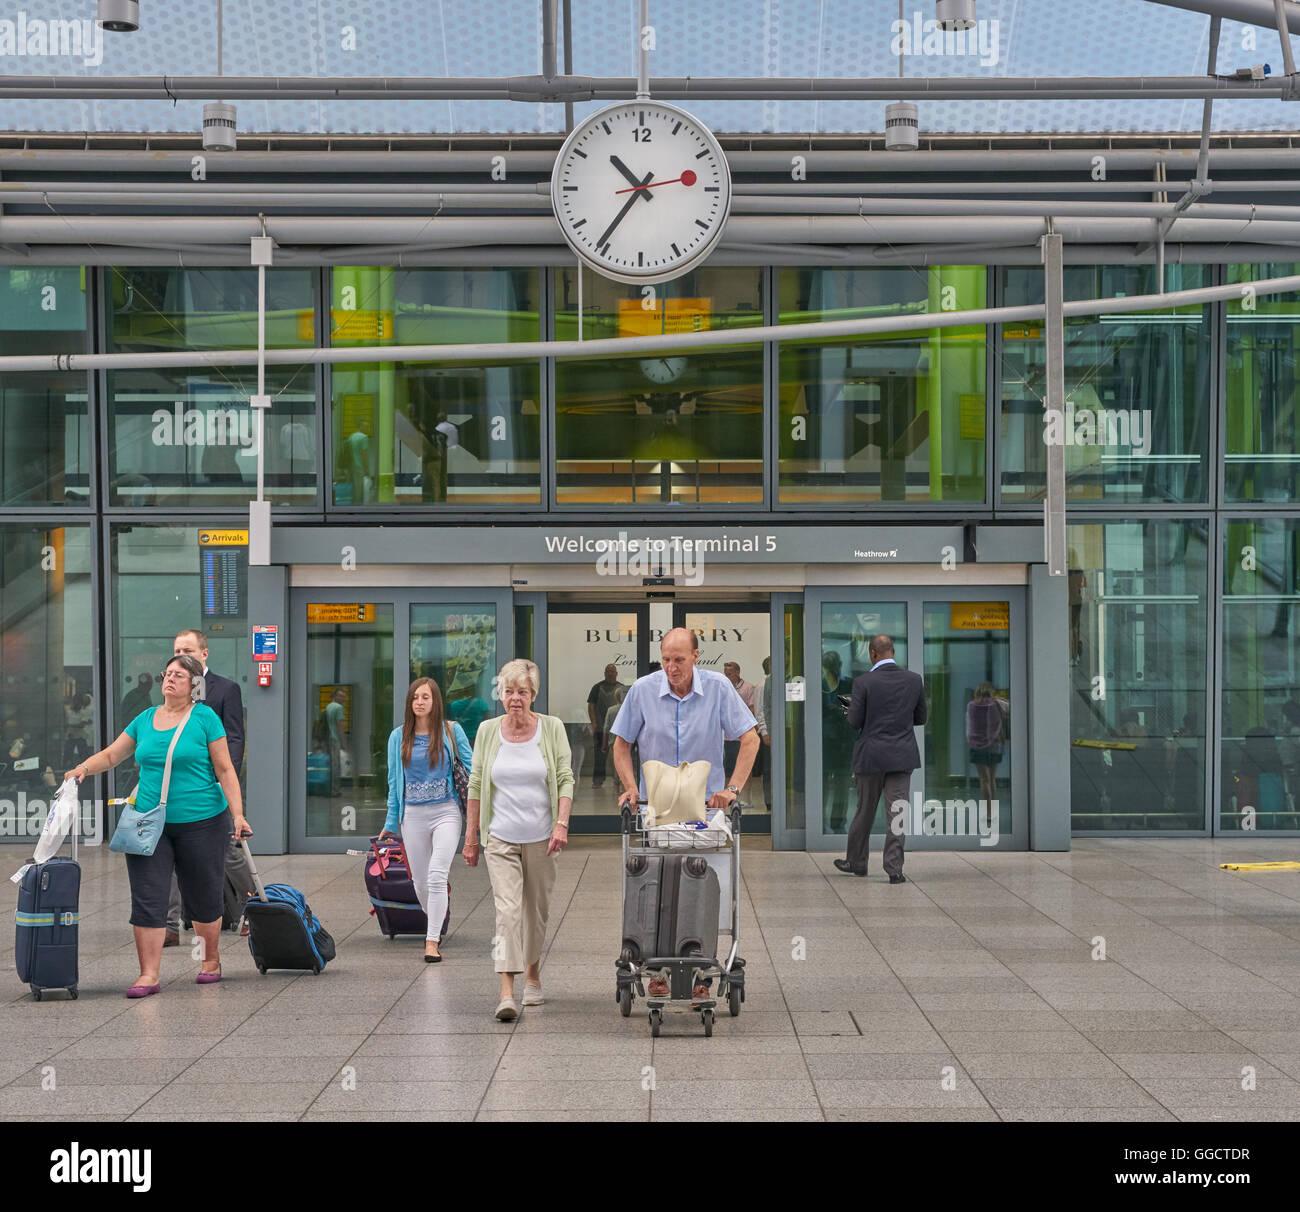 terminal 5 heathrow airport  passengers leaving terminal - Stock Image